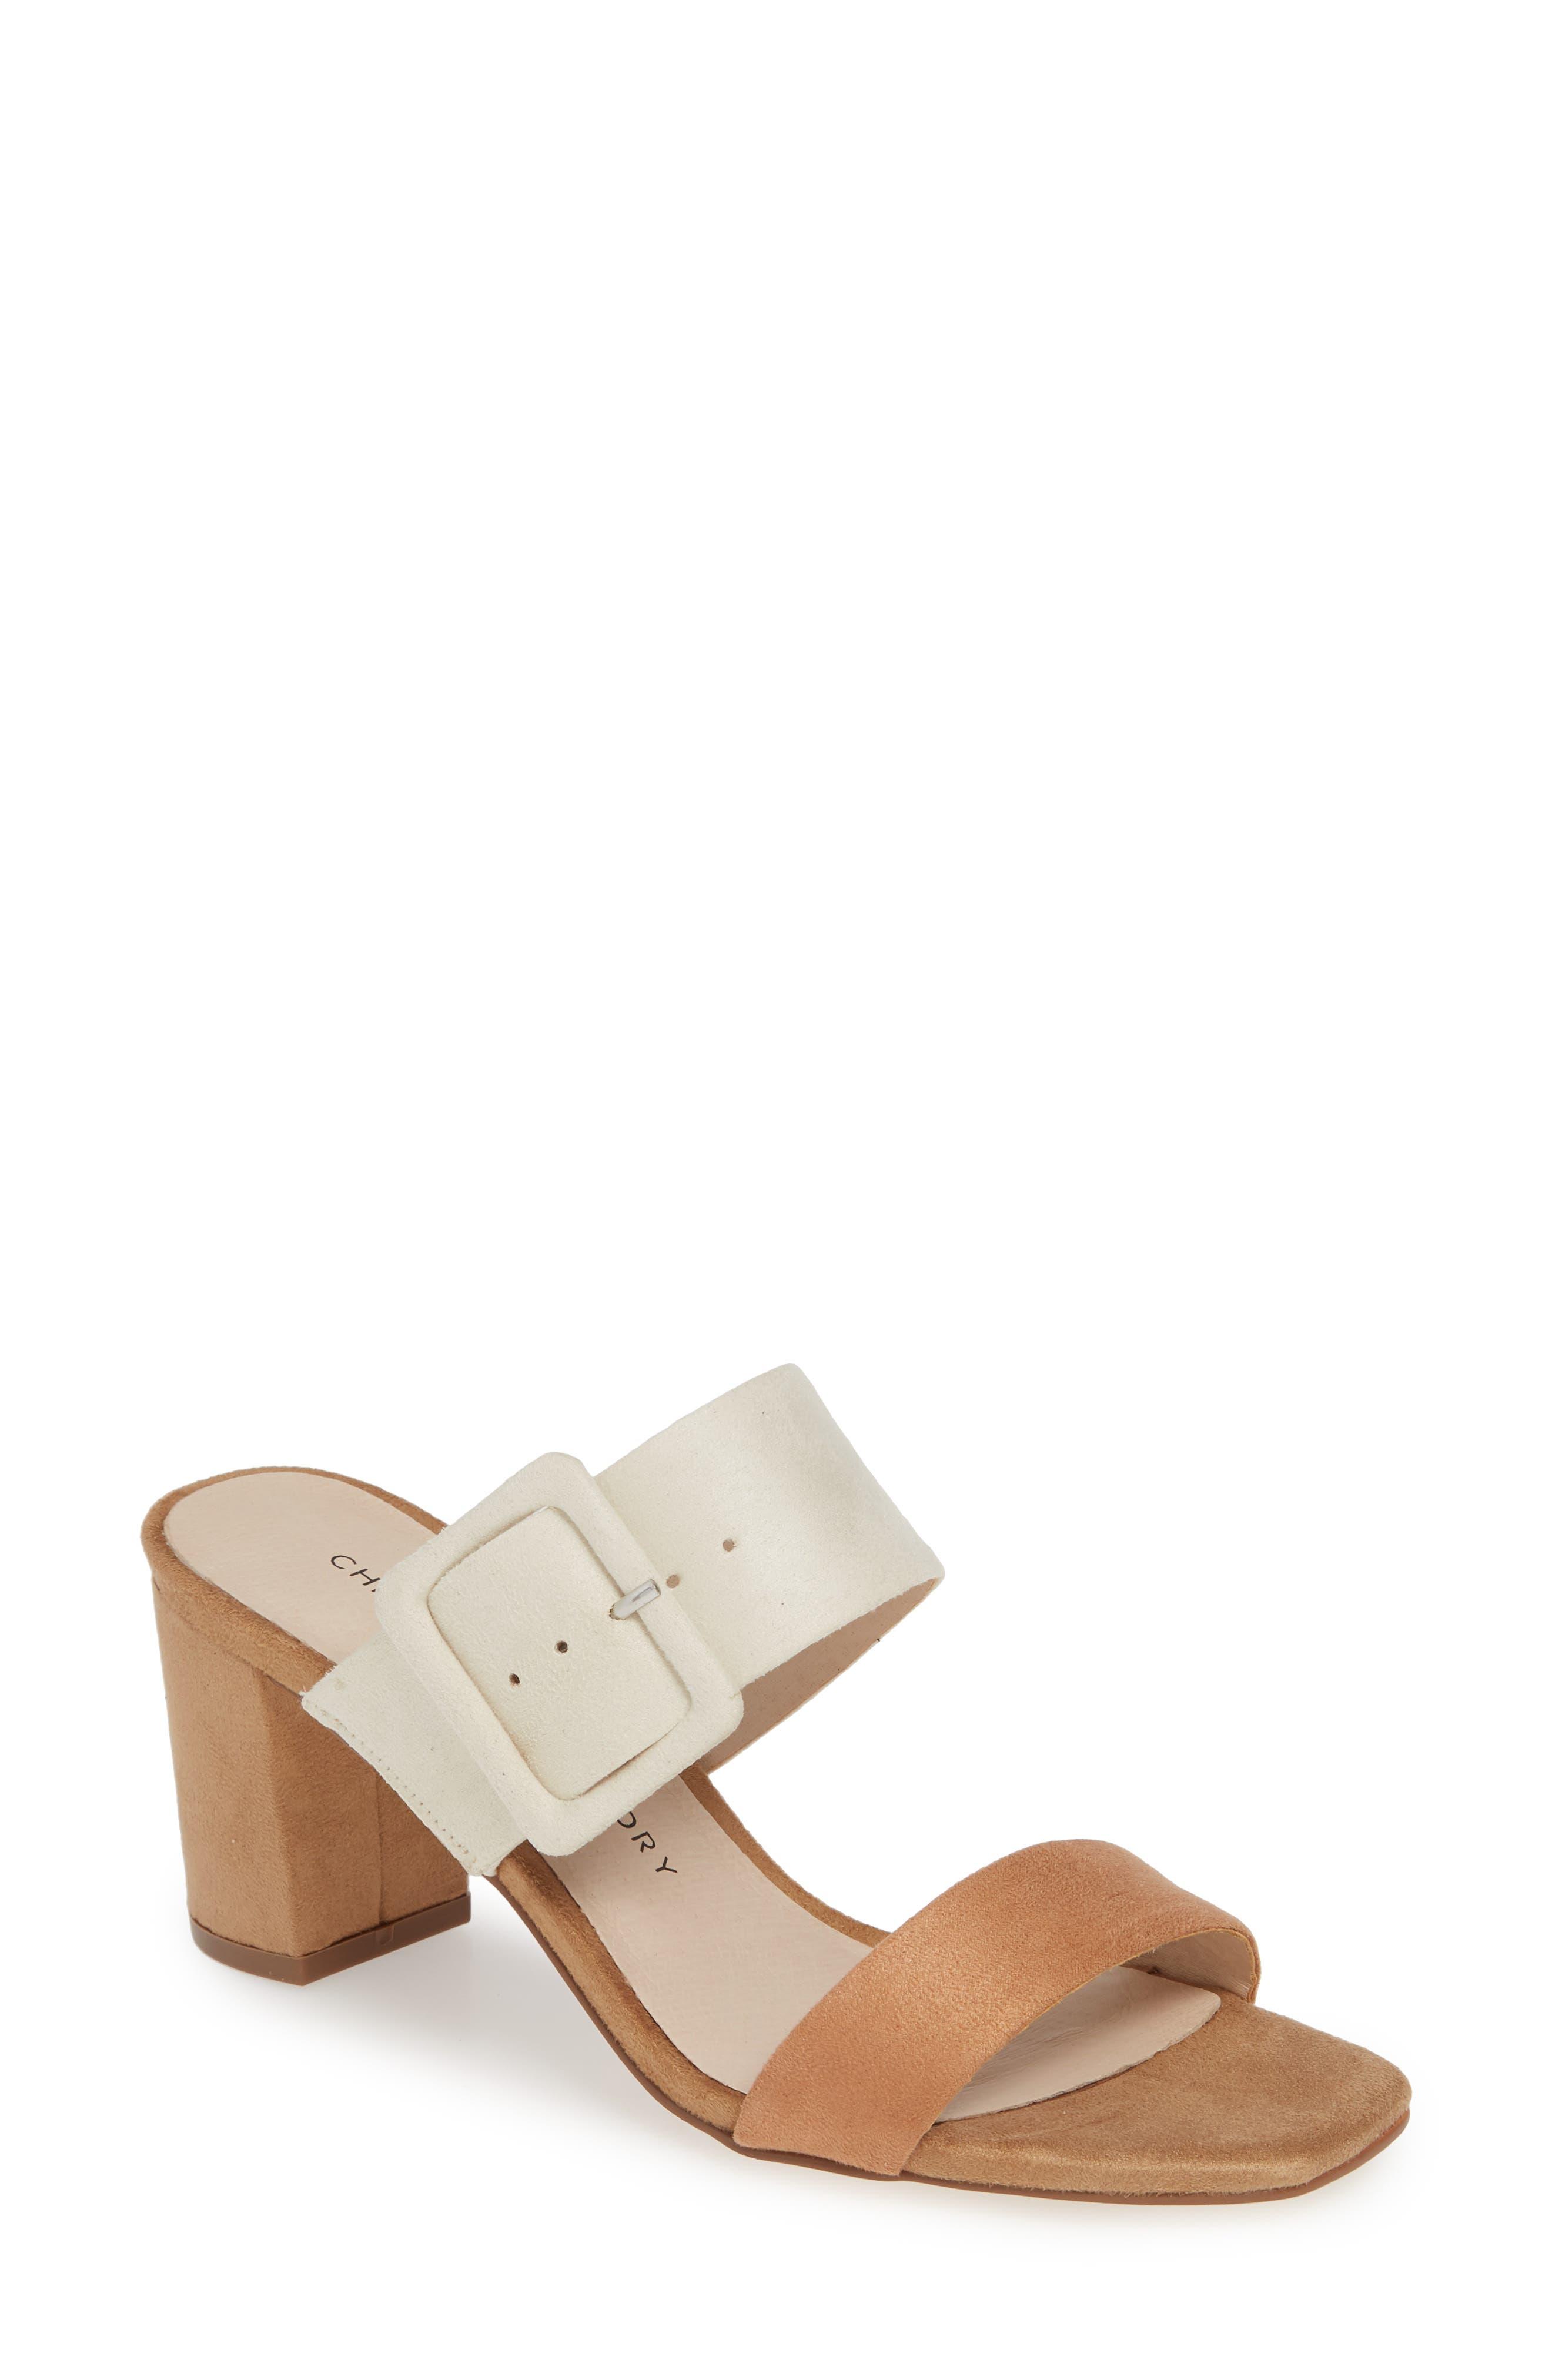 Yippy Block Heel Sandal